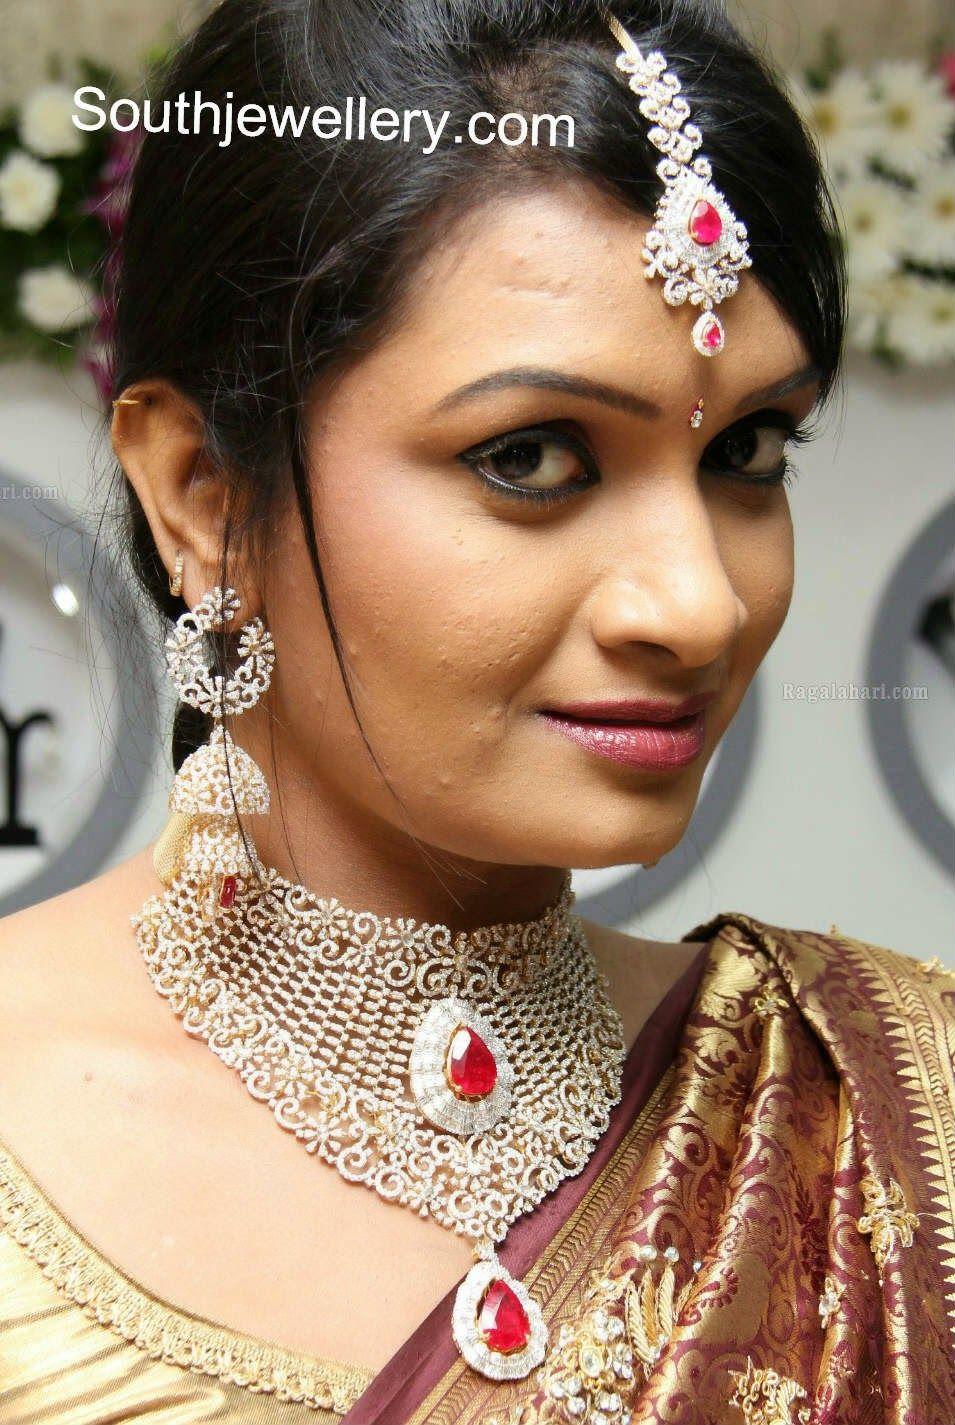 Malabar gold jewellery designs dubai - Malabar Gold And Diamonds Jewelelry Designs